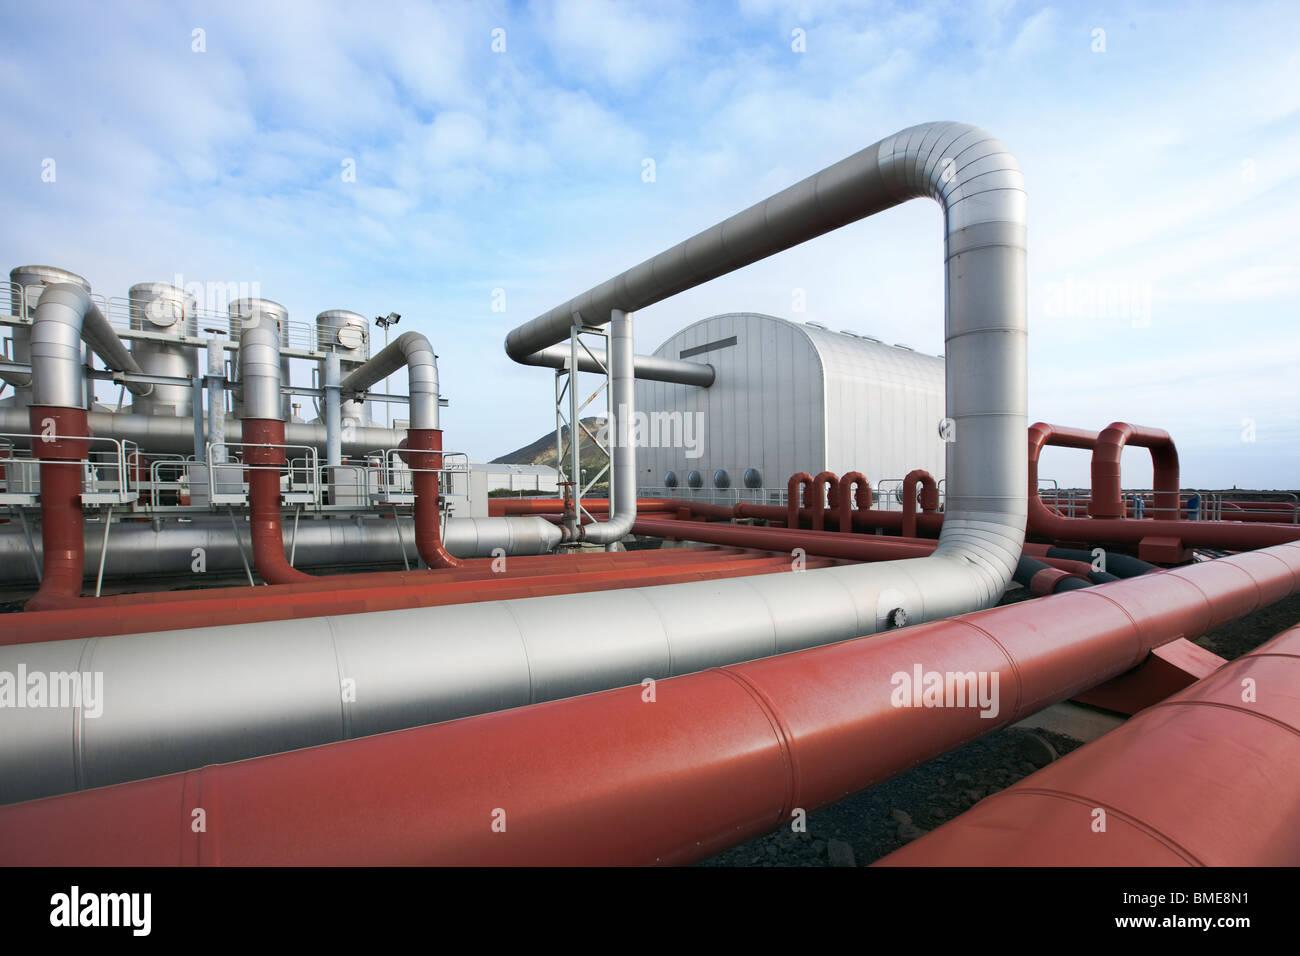 Tubo en la central eléctrica geotérmica Imagen De Stock